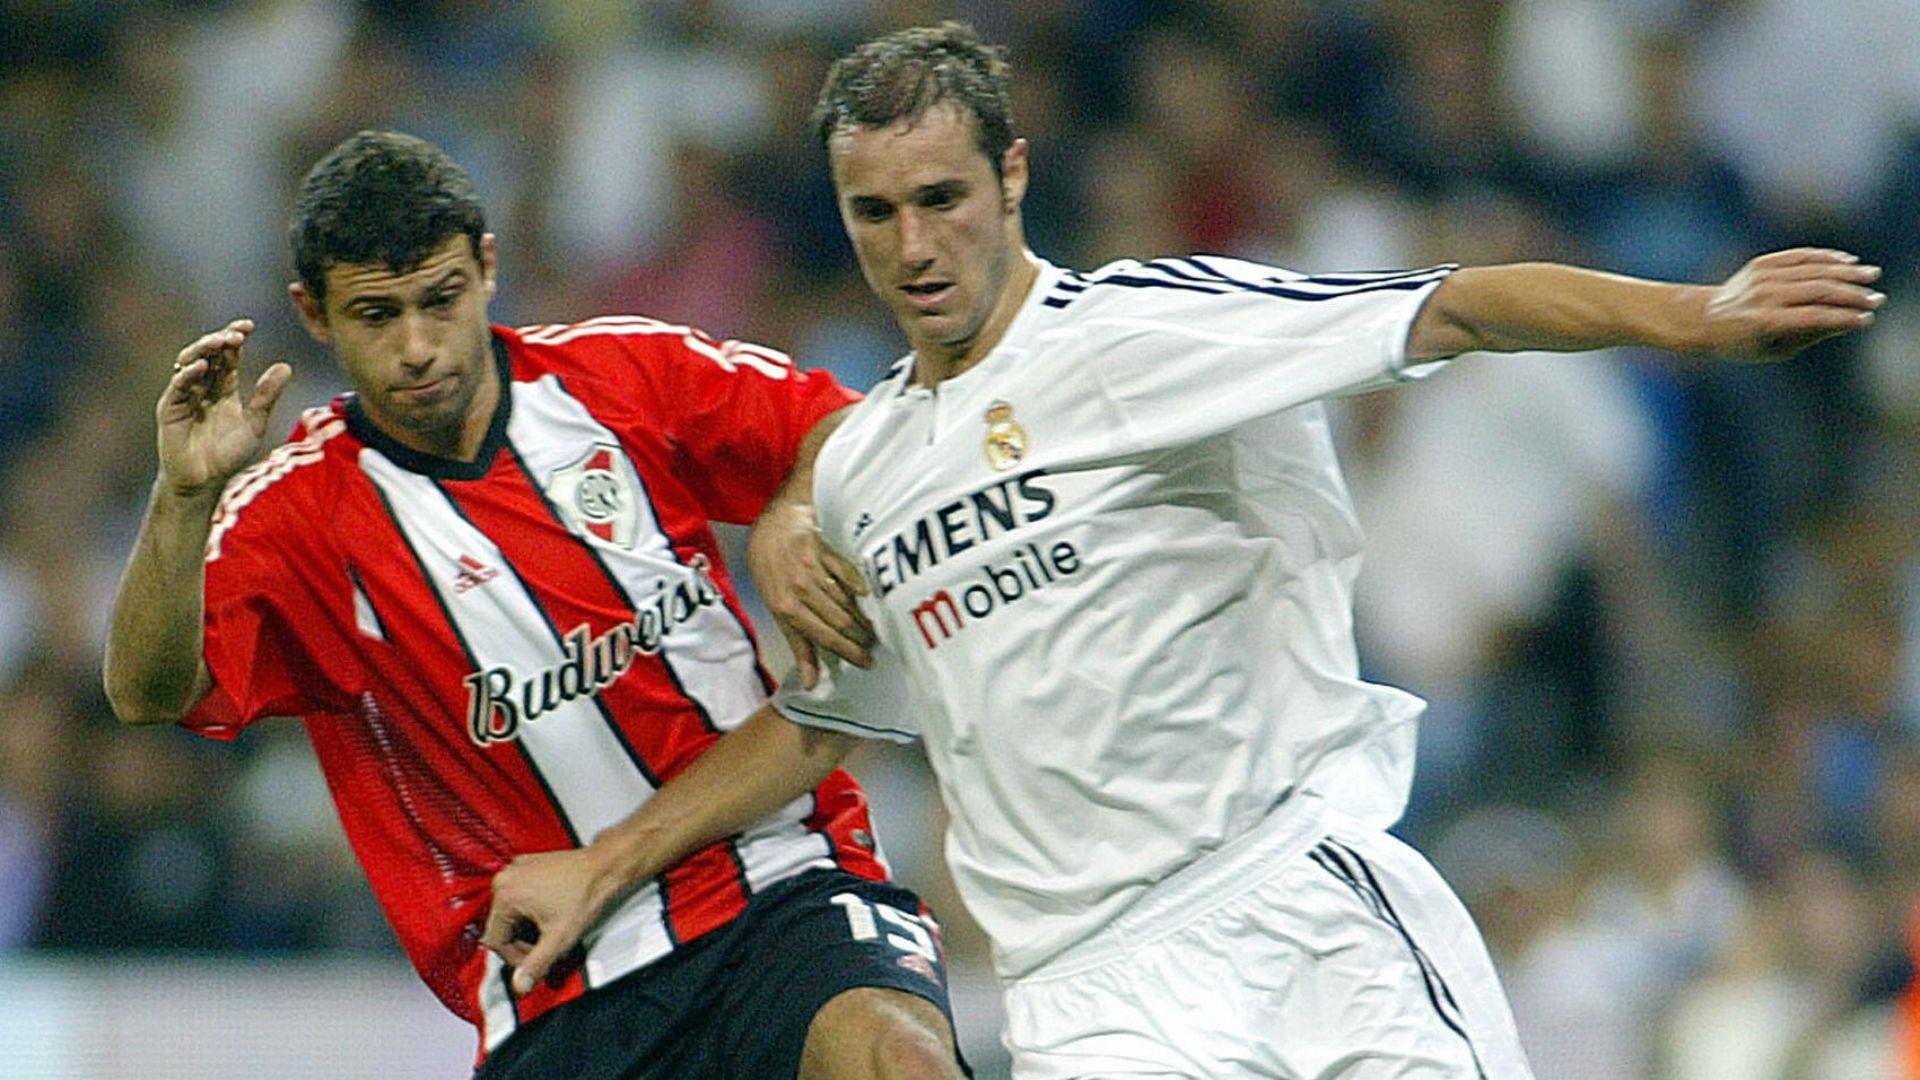 Ivan Helguera Mascherano Real Madrid River Santiago Bernabeu 2003